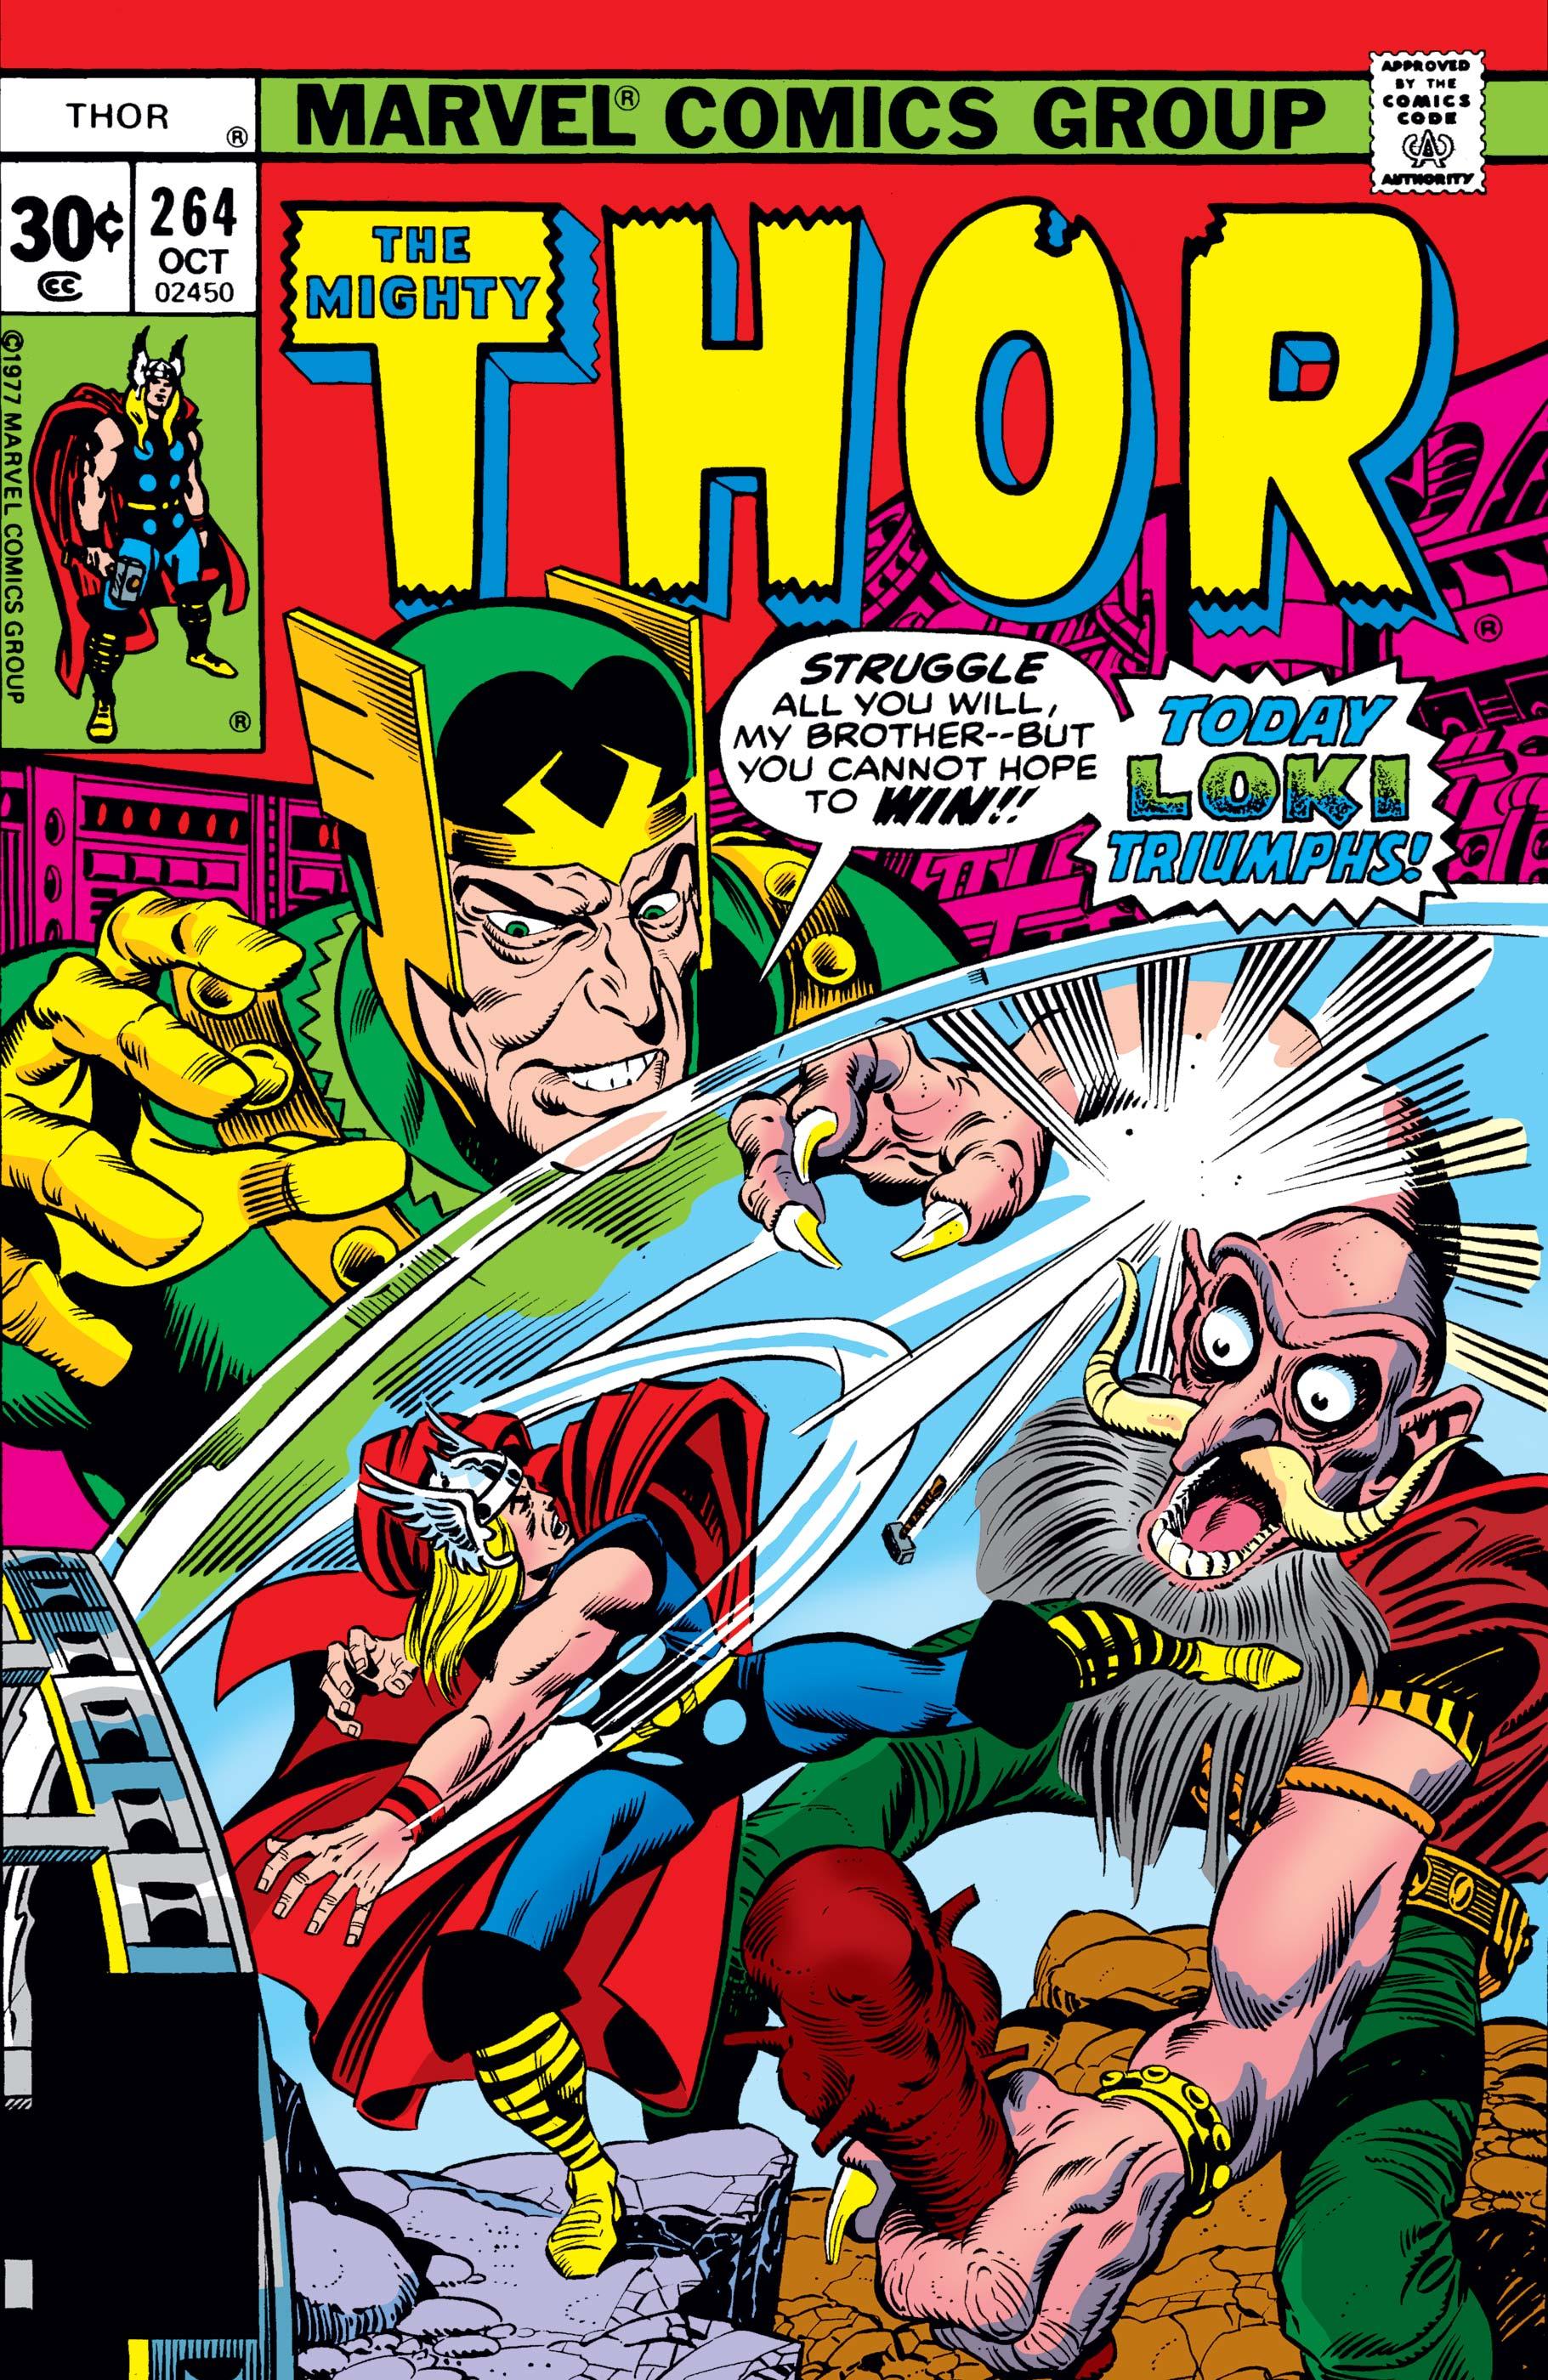 Thor (1966) #264